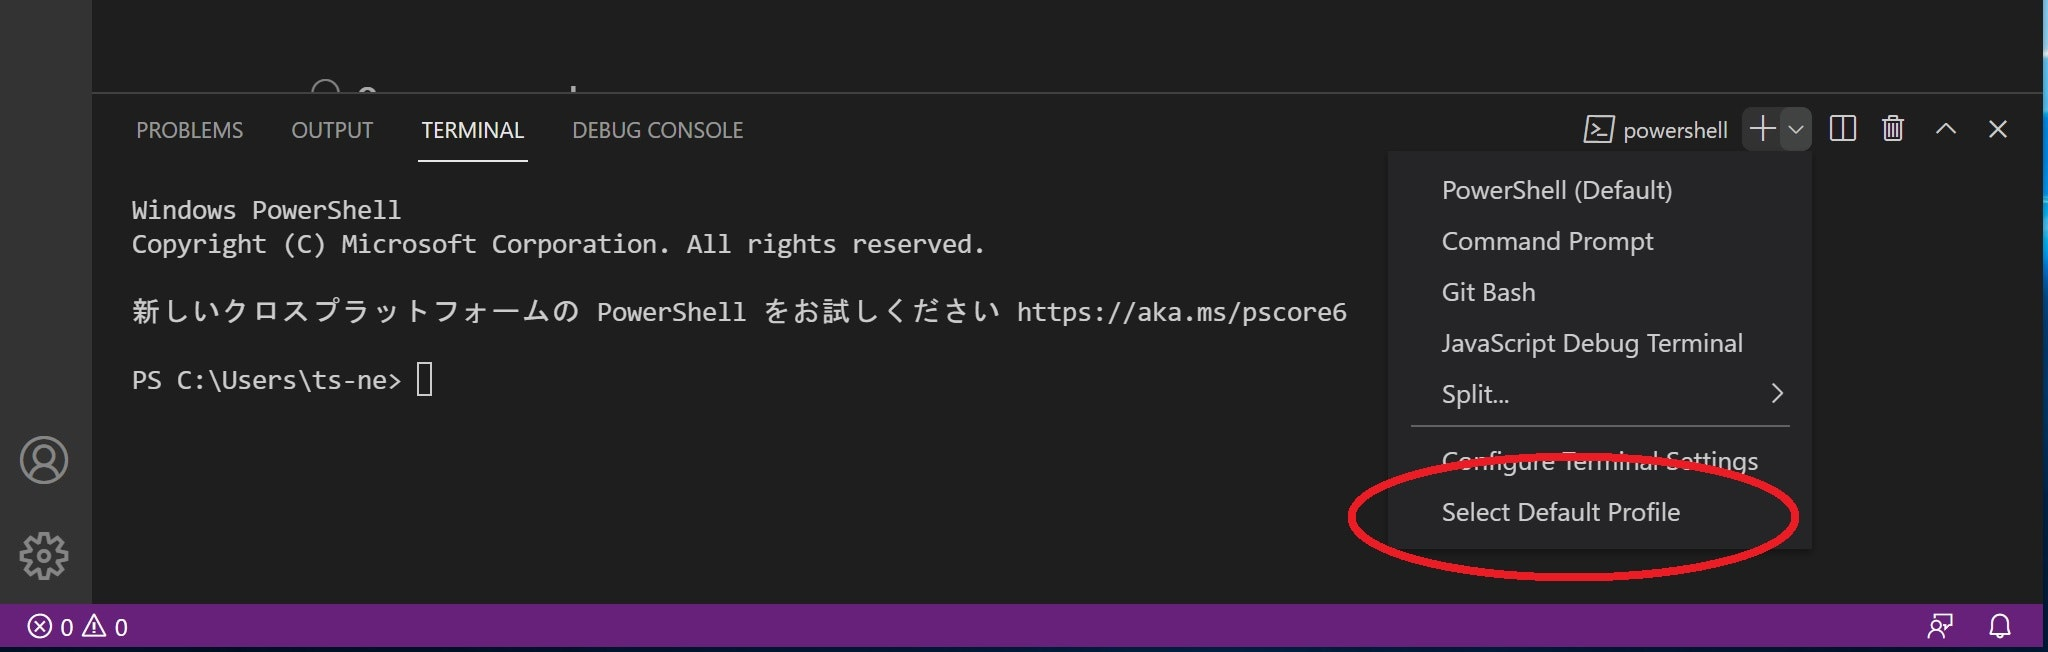 Visual Studio Code の Select Default Profile メニュー